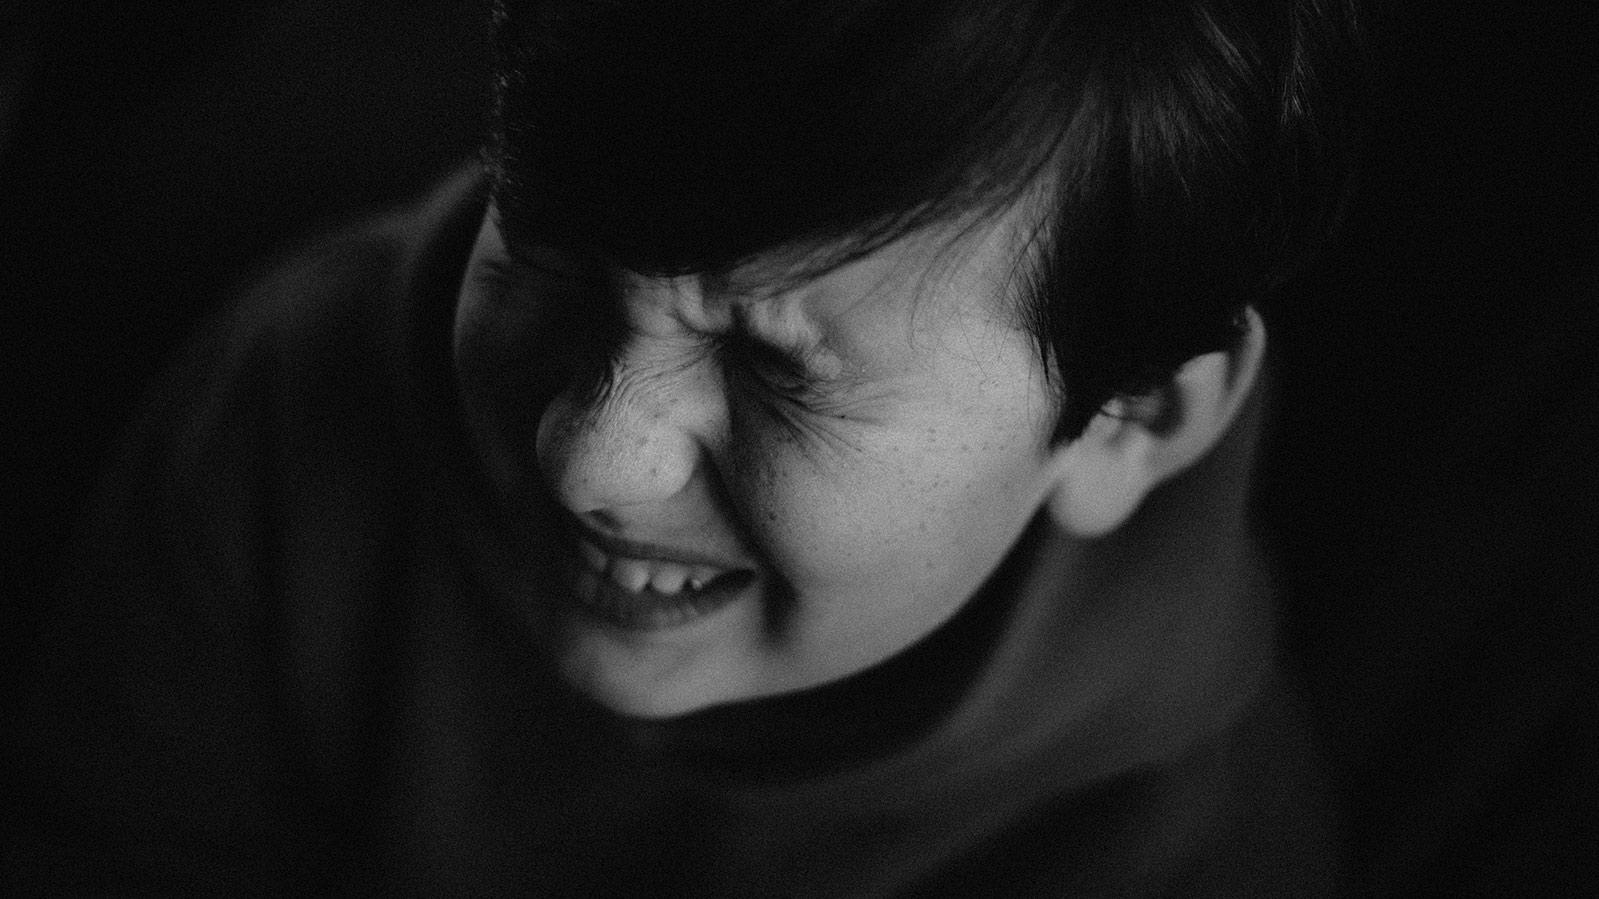 boy grimacing in pain